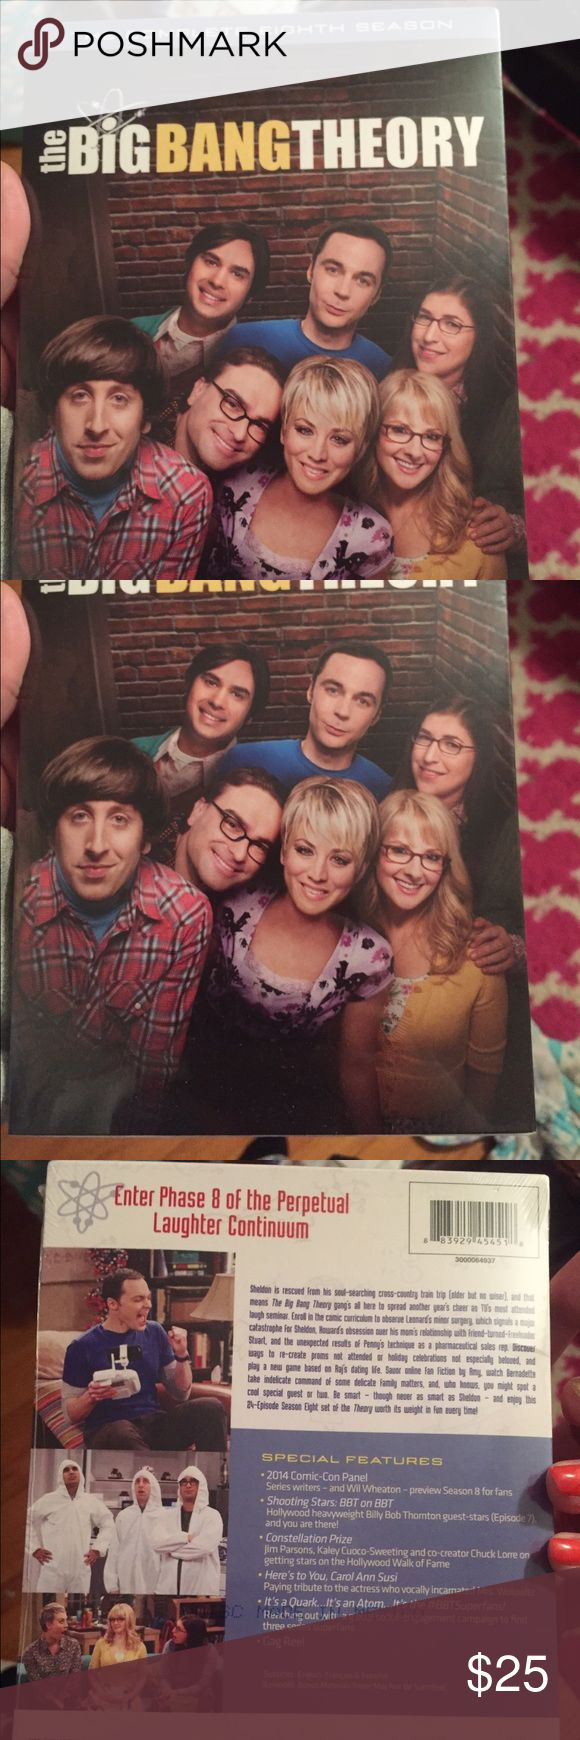 Big Bang Theory Season 8 DVD Set NWT NWT Big Bang Theory complete season 8 DVD set. Still in the package. Other